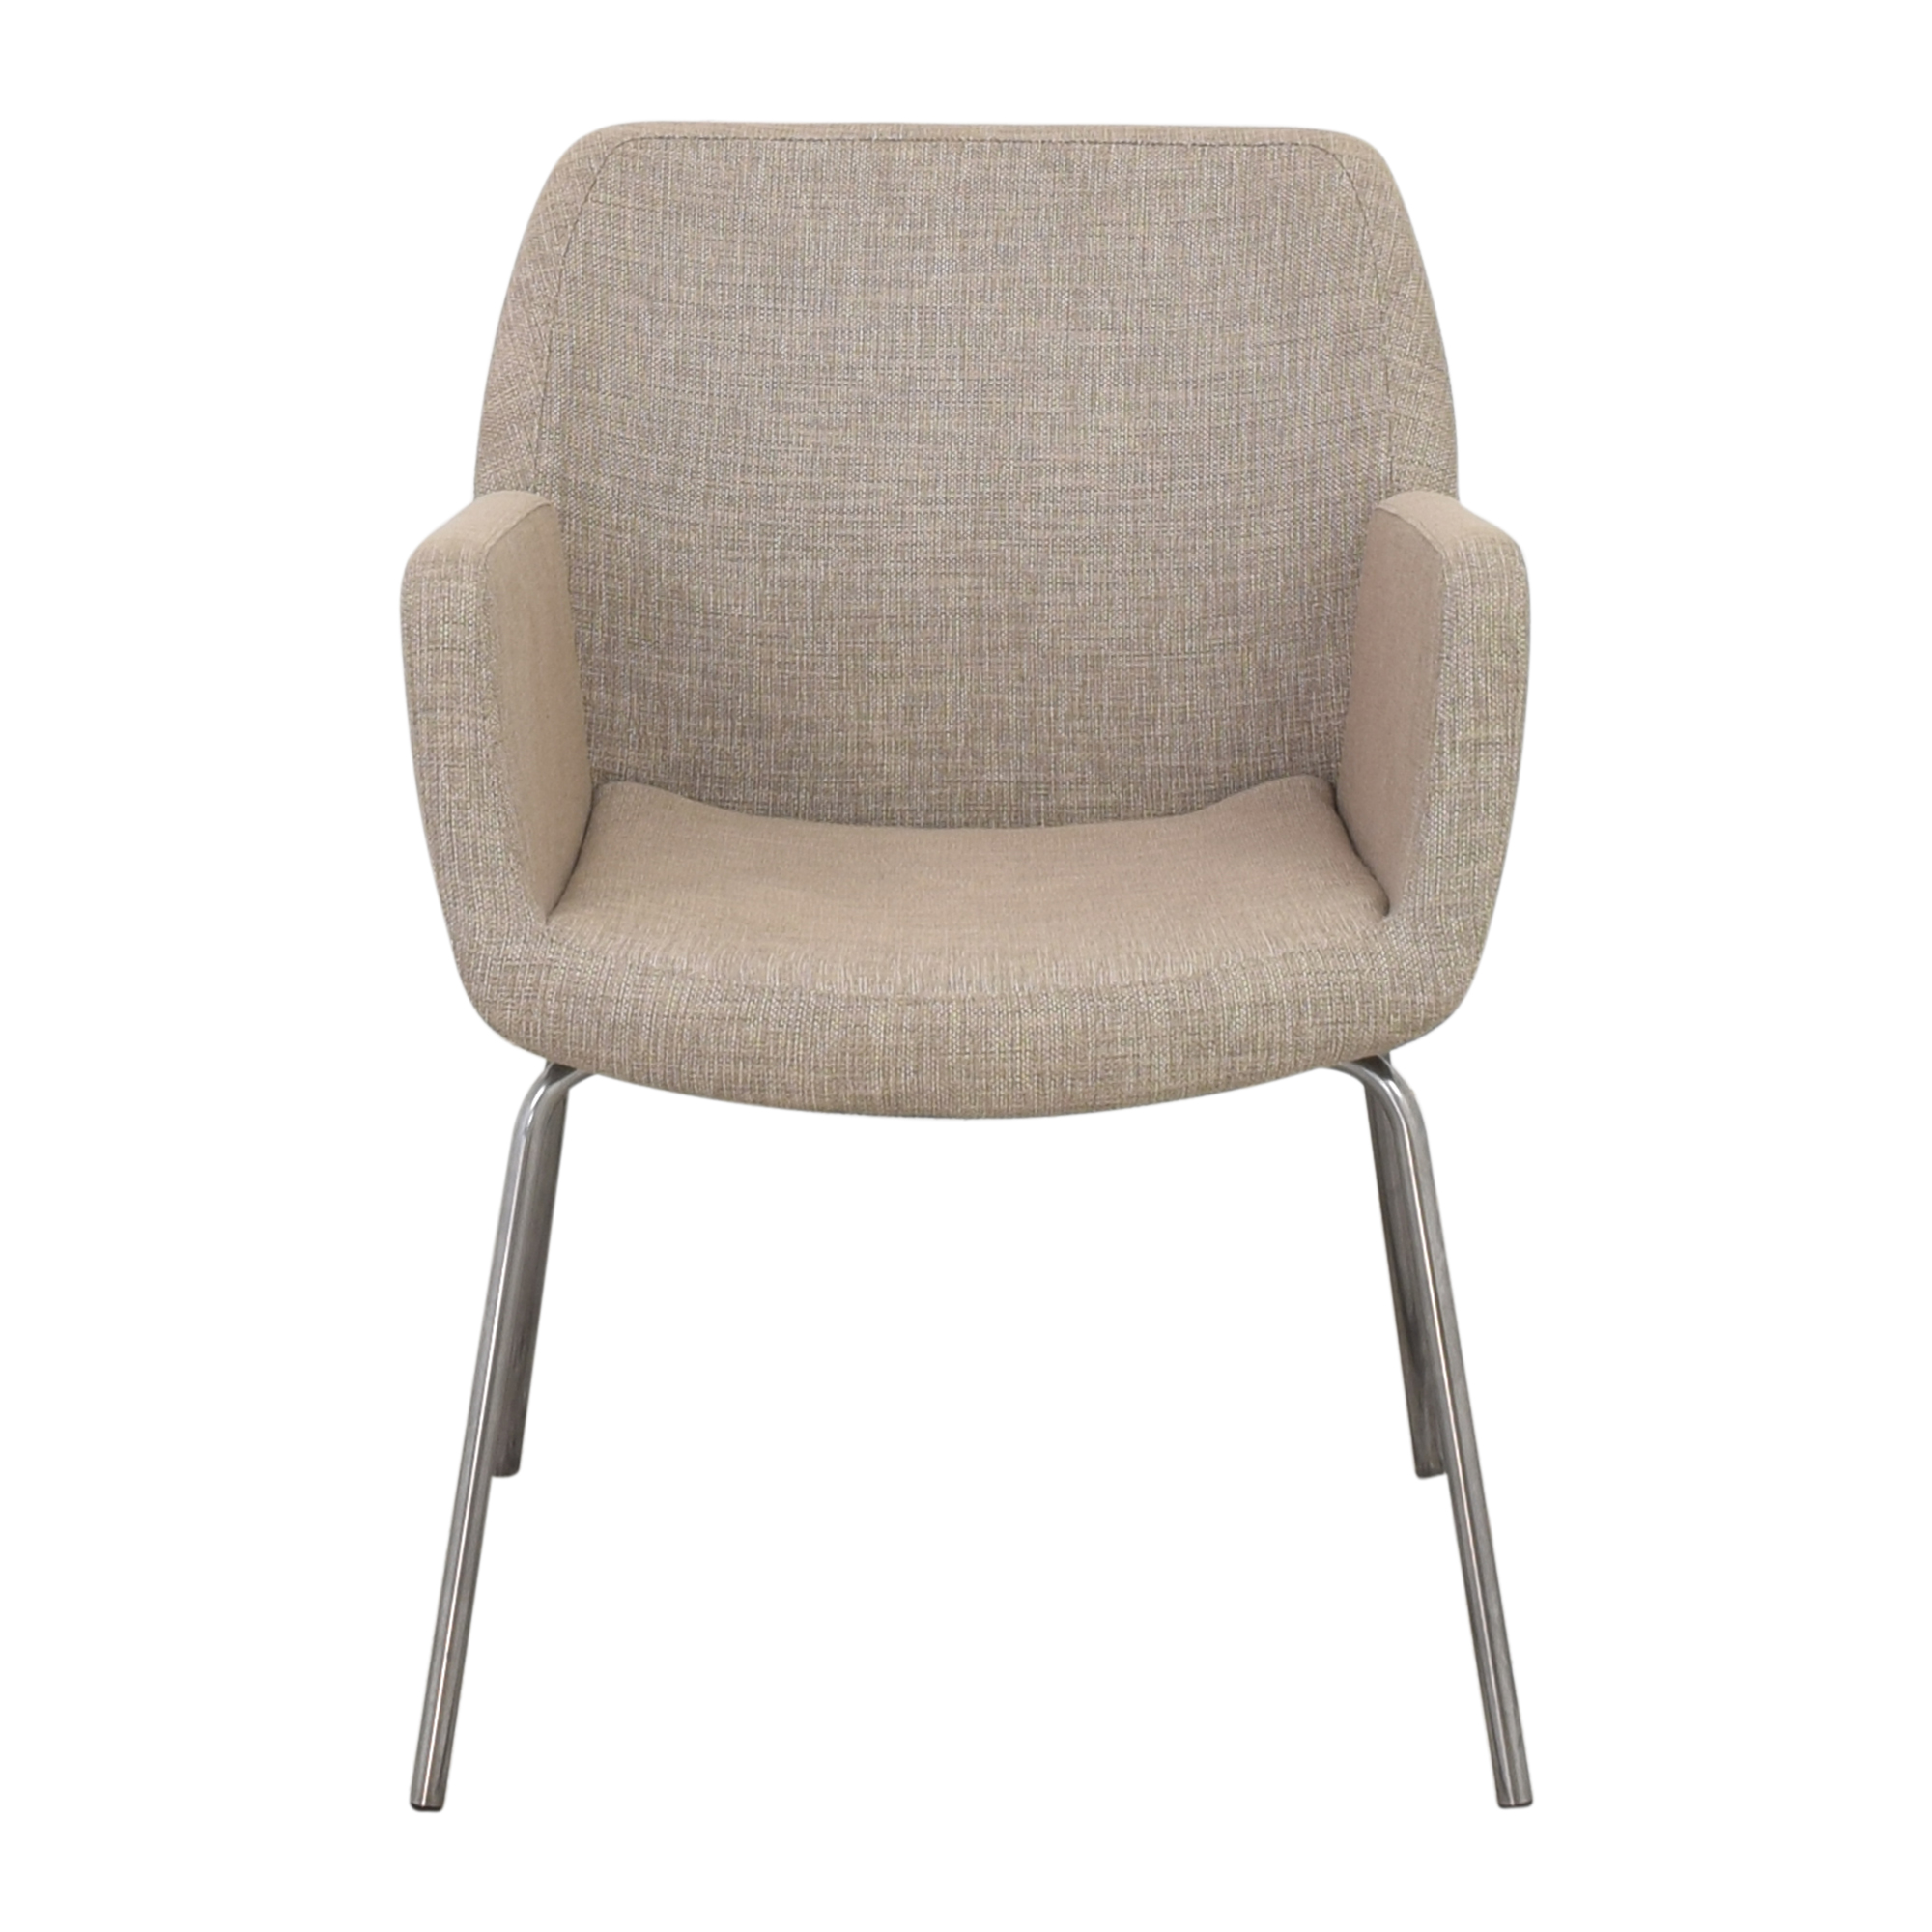 Steelcase Steelcase Coalesse Bindu Side Chair for sale